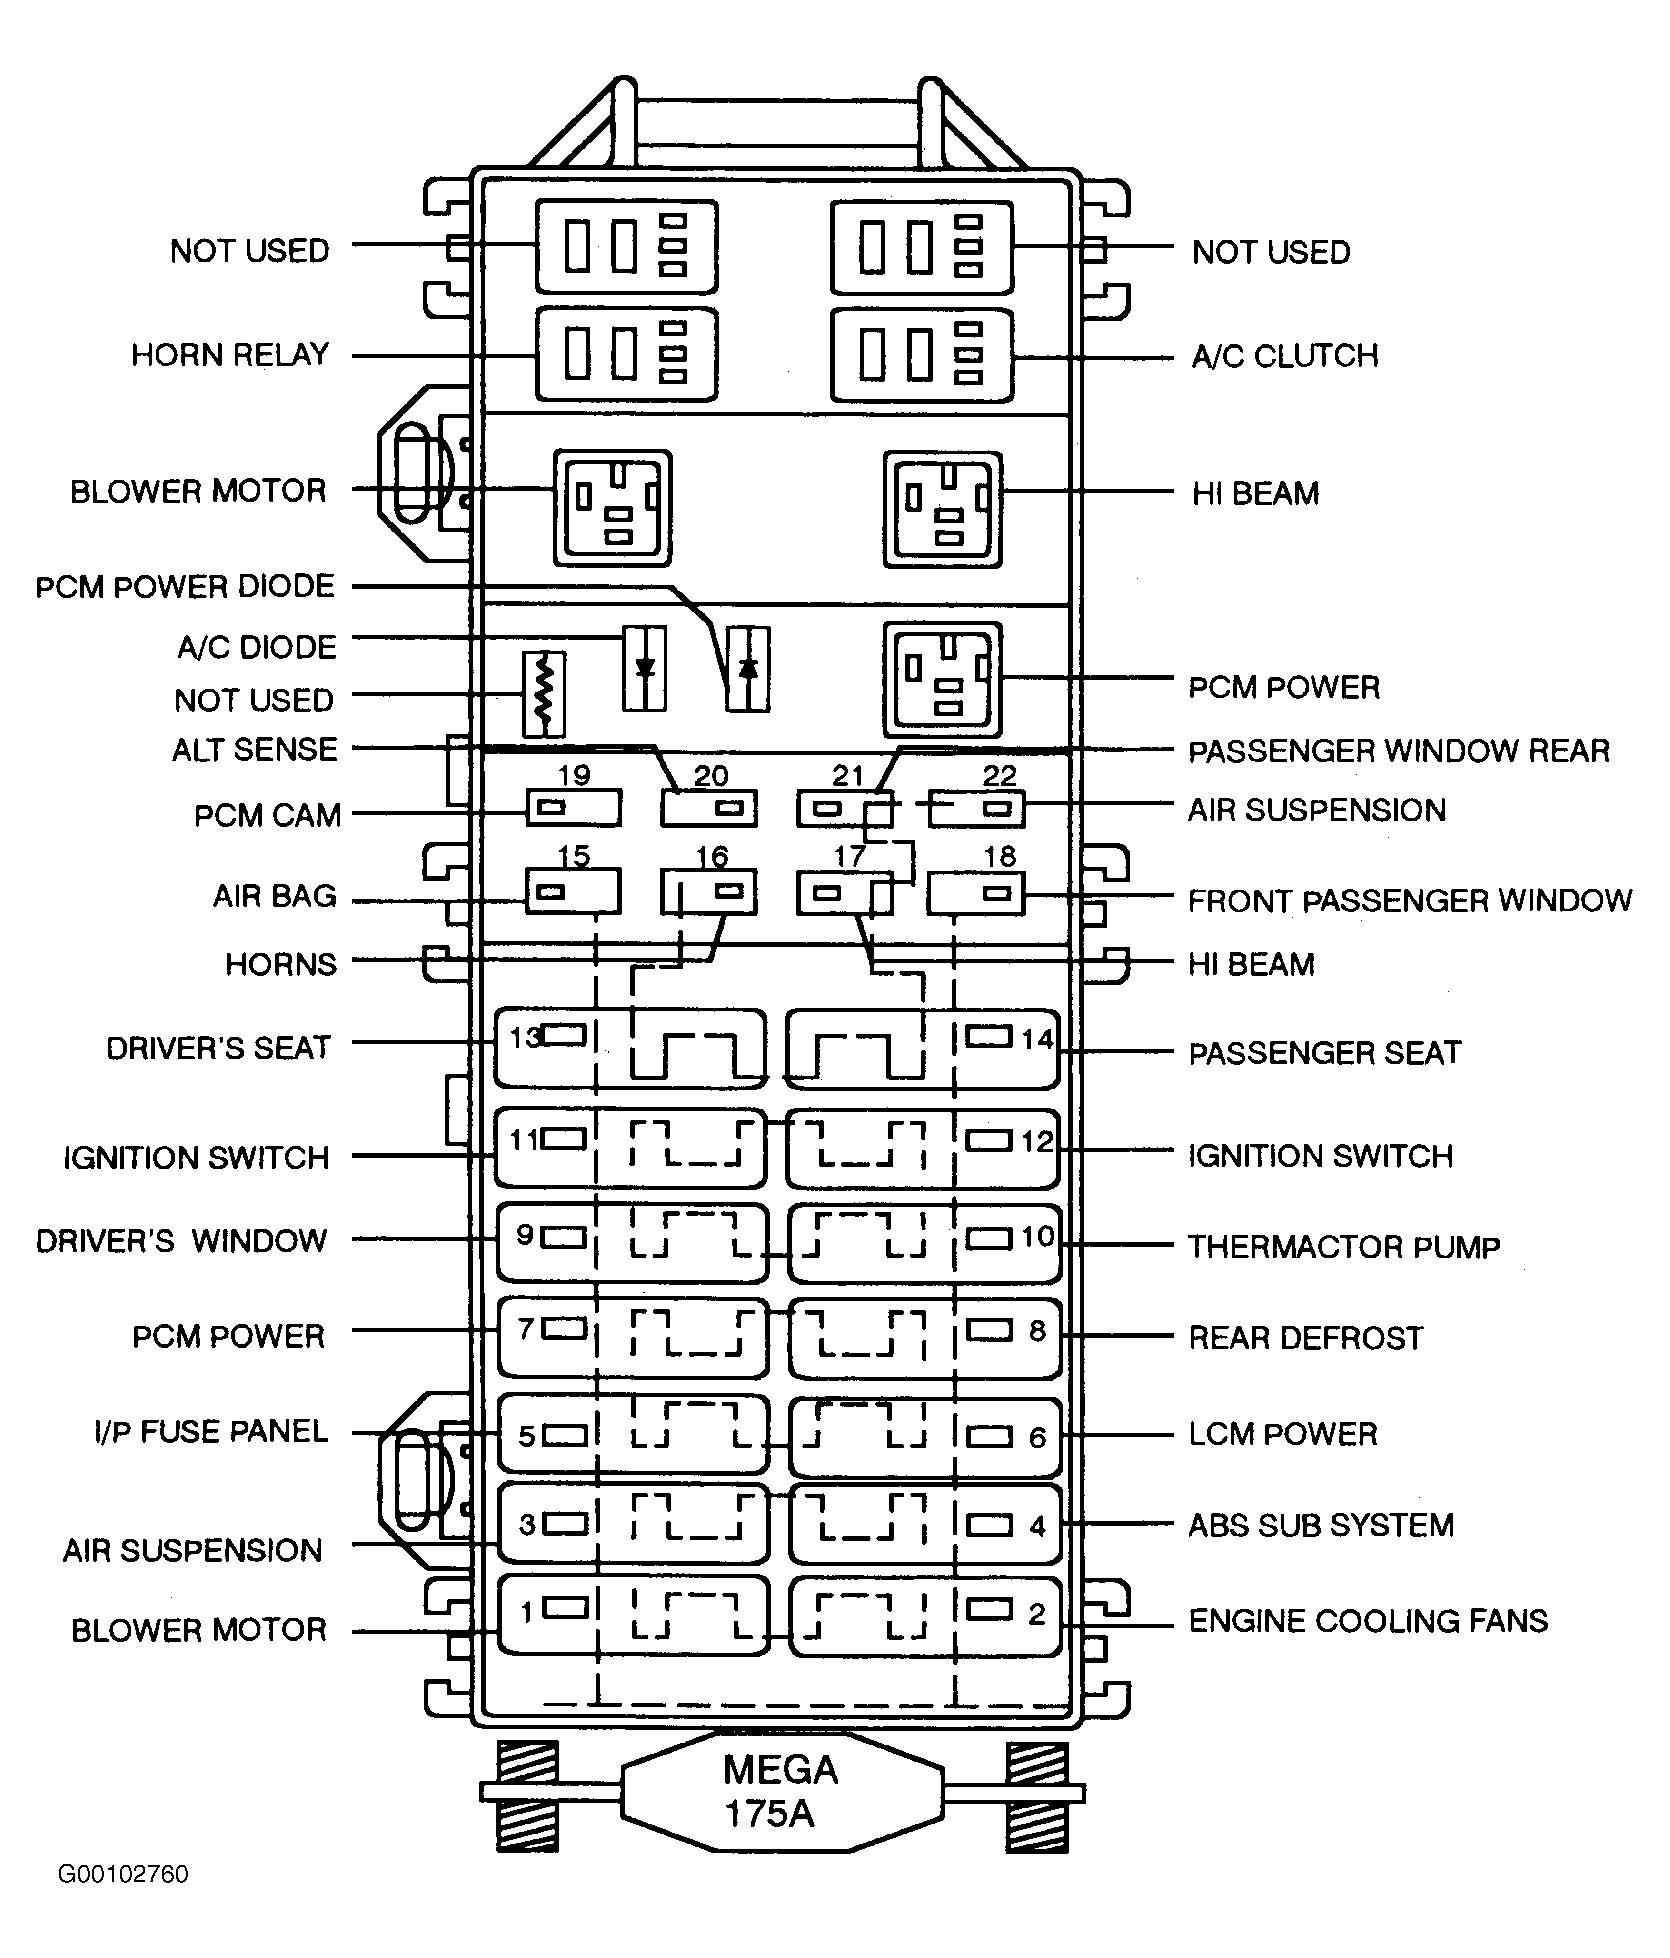 Diagram 1986 Lincoln Town Car Fuse Box Diagram Full Version Hd Quality Box Diagram Diagrampcy Orbicolare It